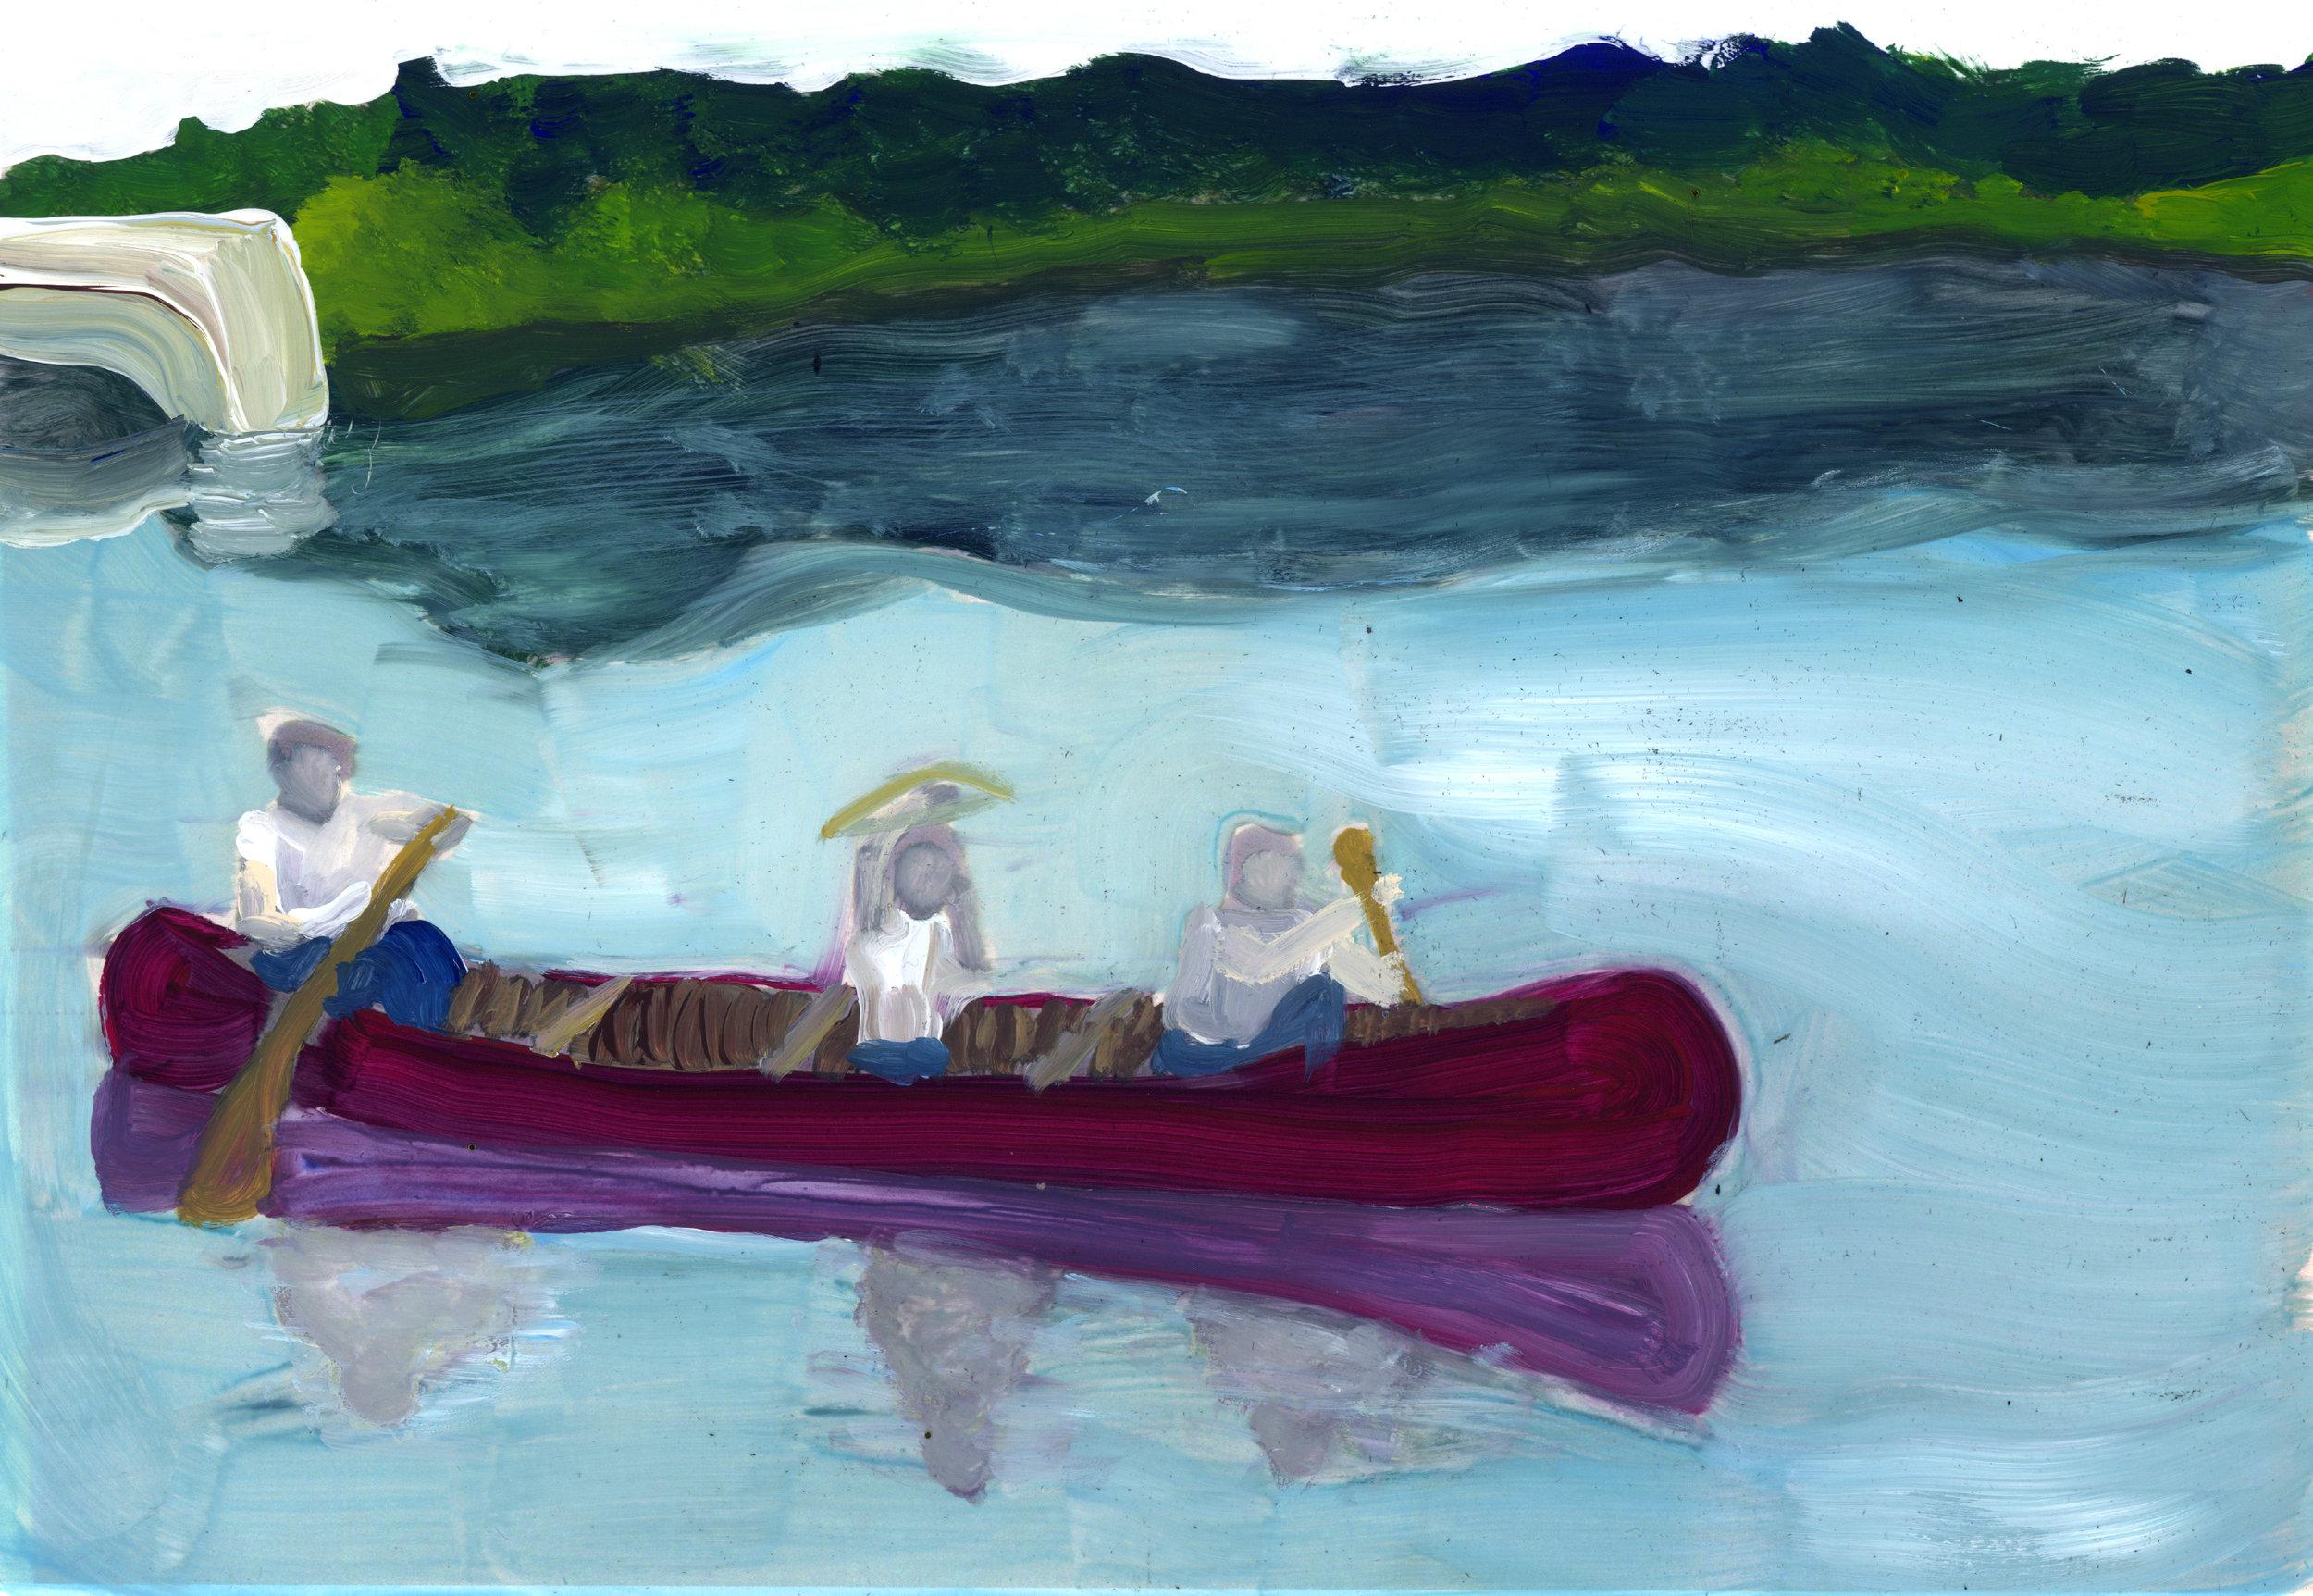 Summertime on the creek